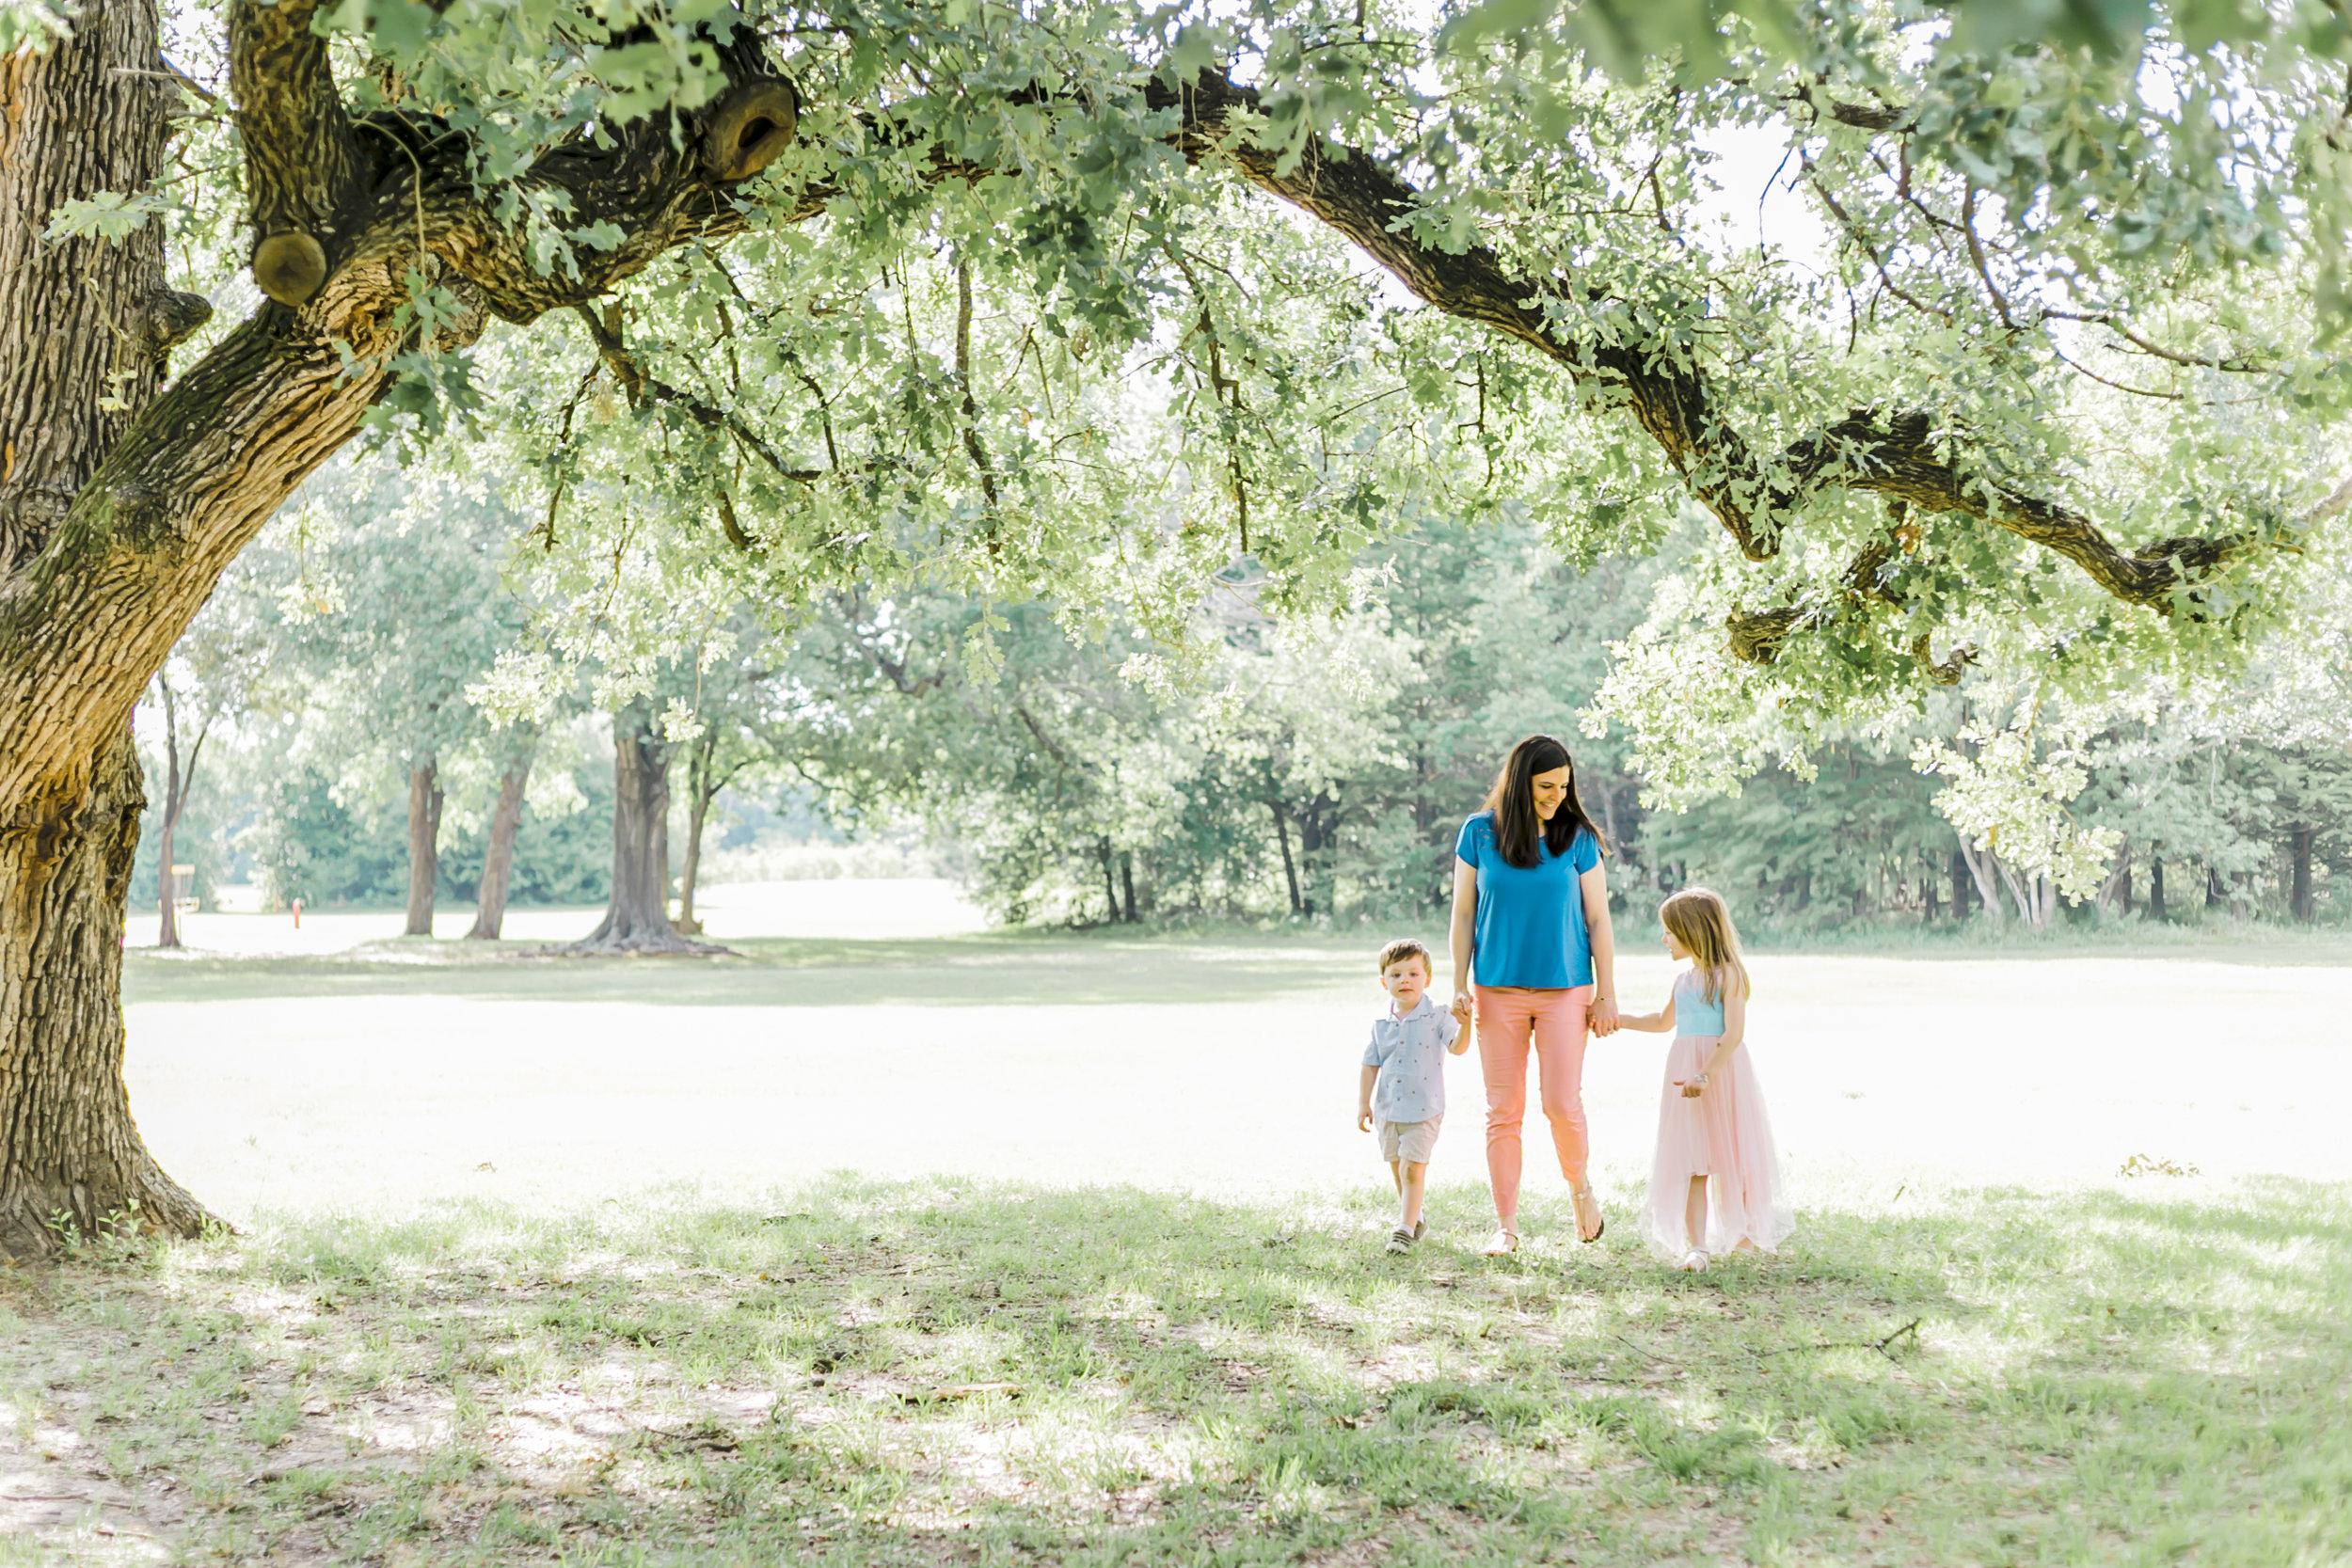 MothersDayMini-Blog-Kinnon-2.jpg